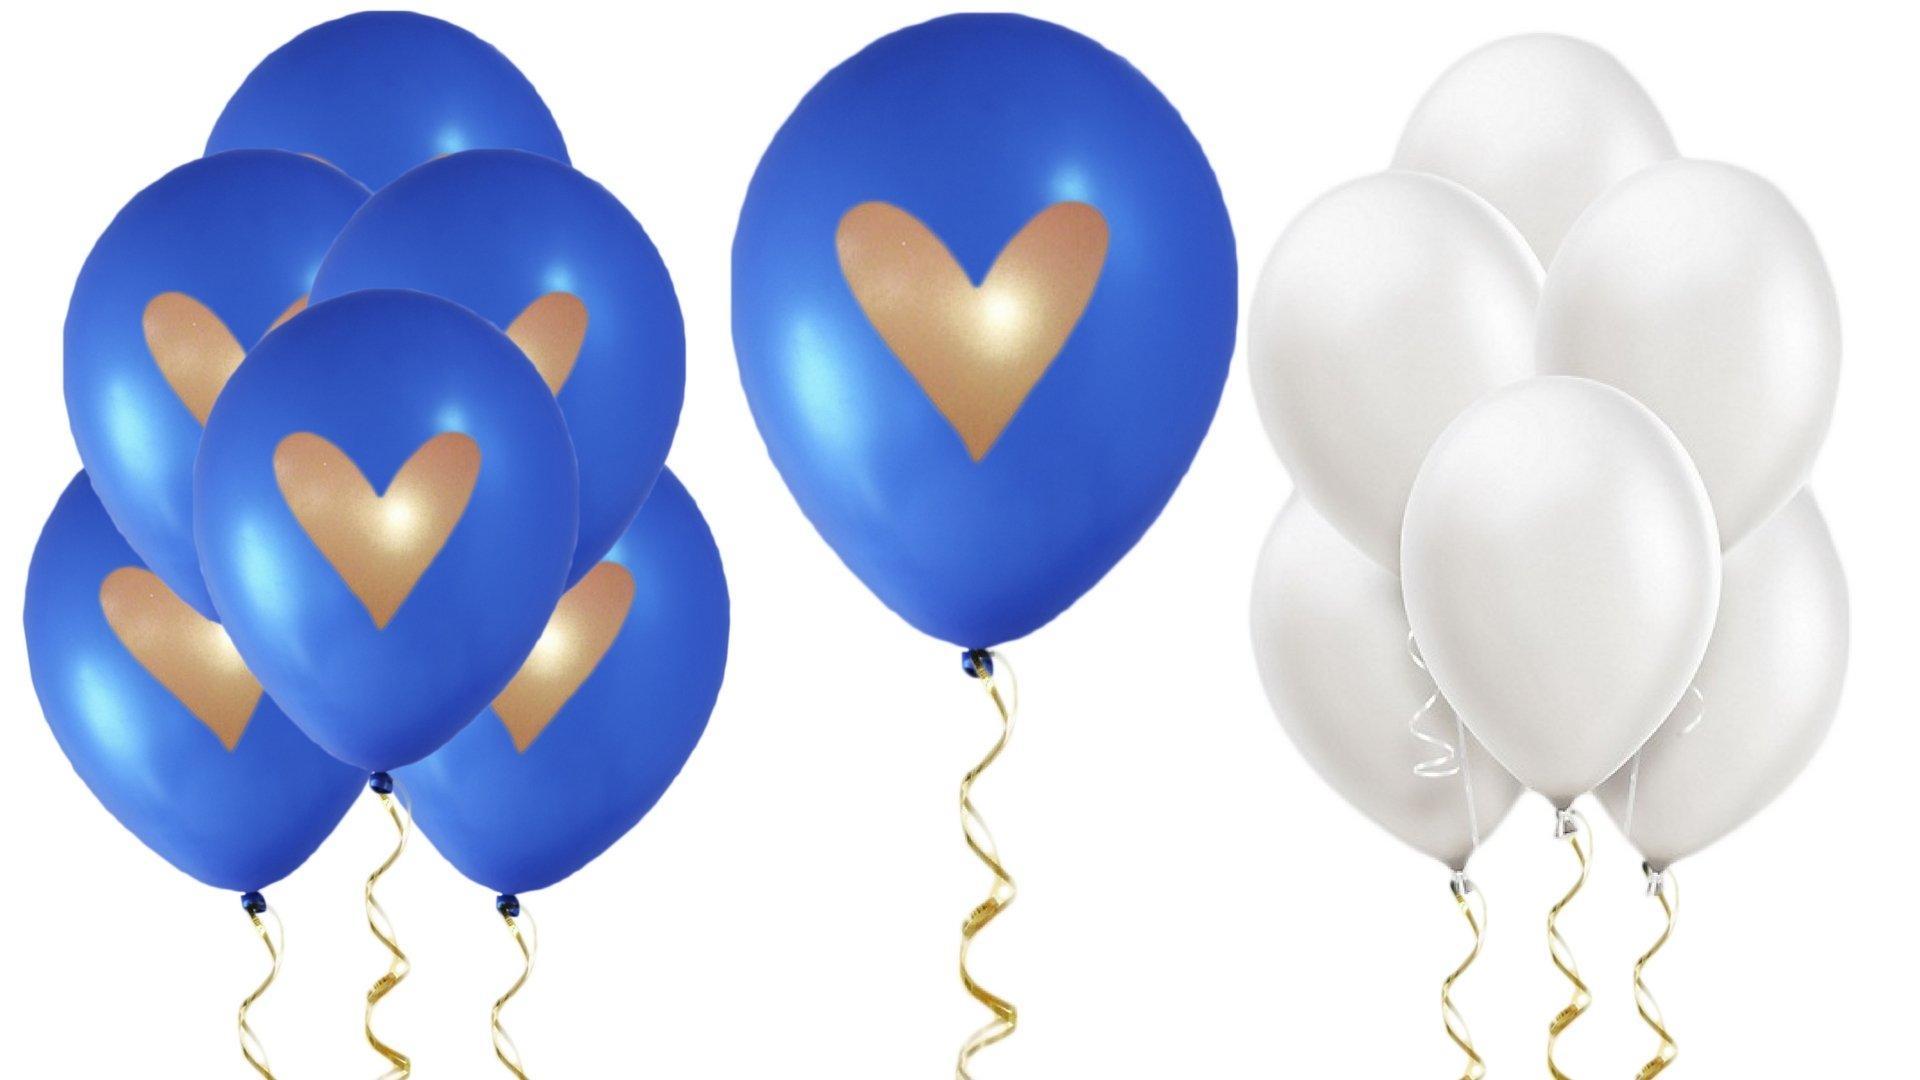 Blue White Gold Heart Balloons Love 12'' Latex Wedding Decoration Kit Proposal Vow Renewal Valentine's Bridal Shower Party Bachelorette Celebration Anniversary Royal Dark (No Ribbon)